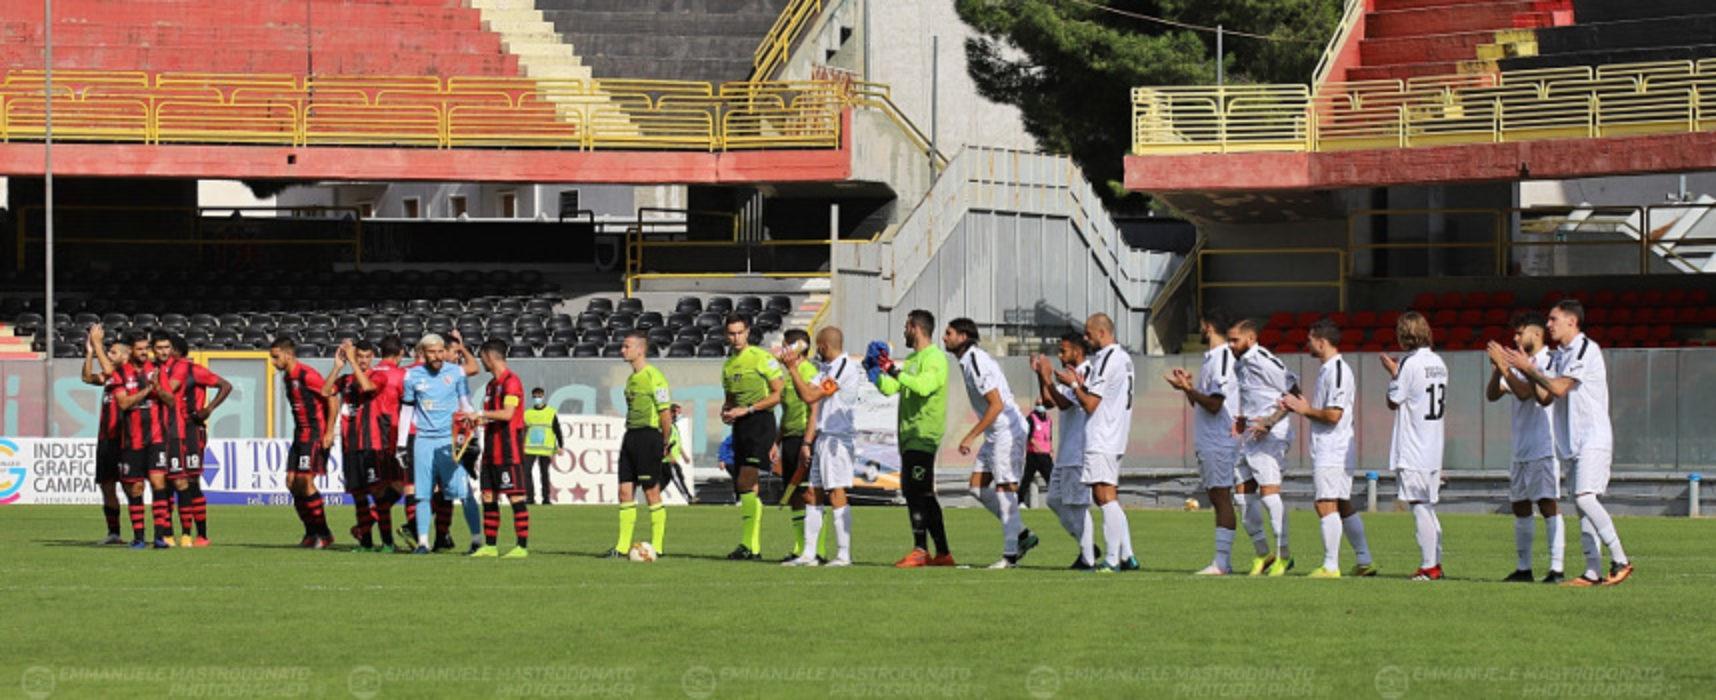 Catania – Bisceglie rinviata a data da destinarsi